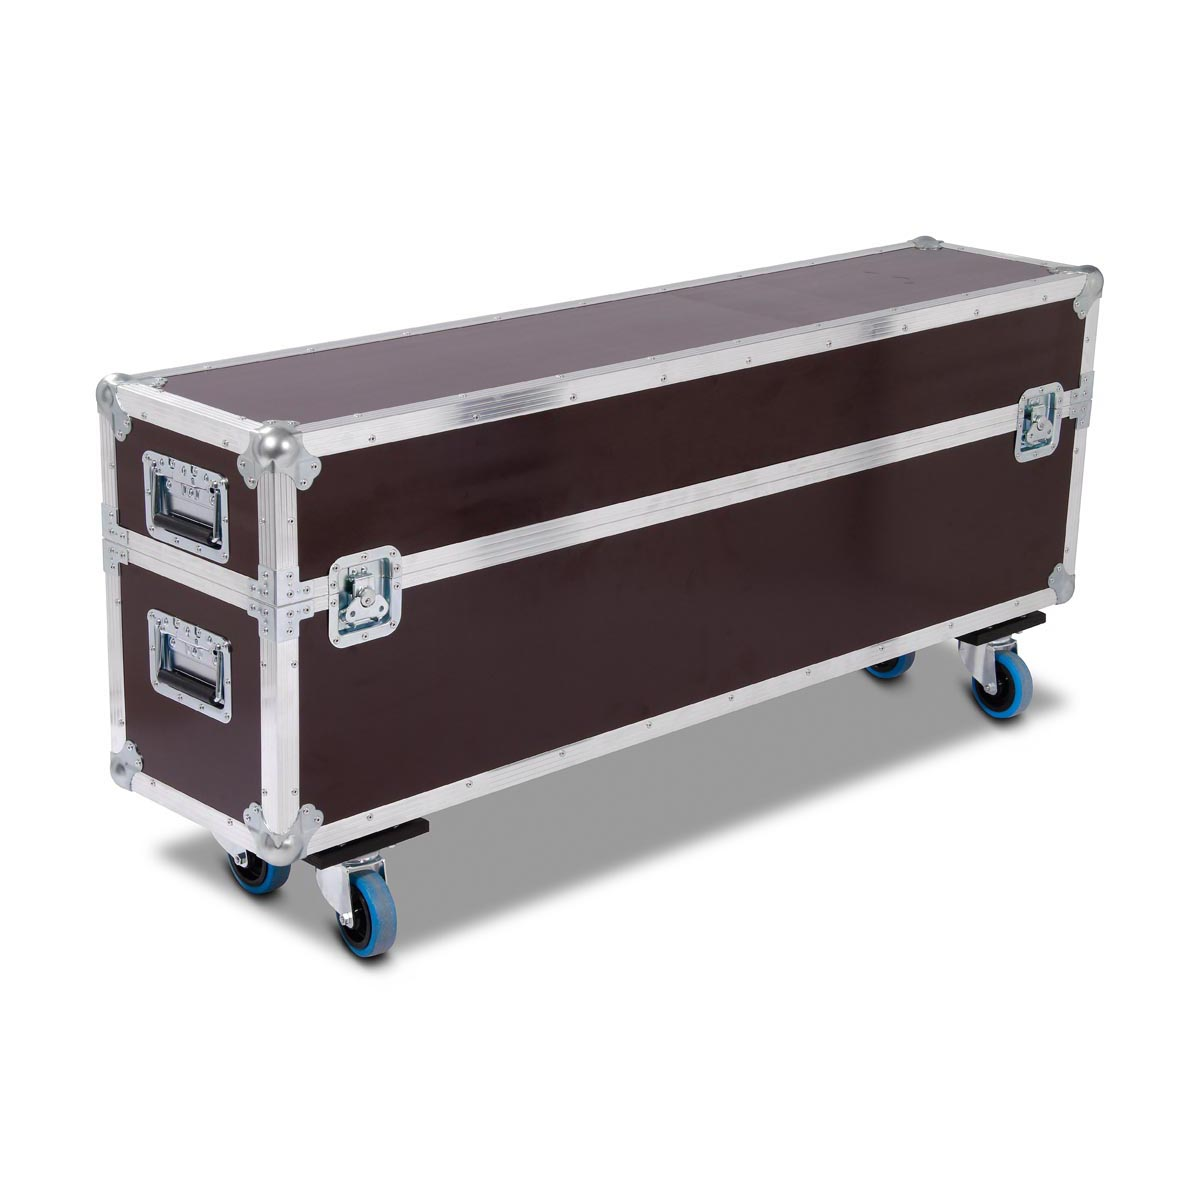 profi truhencase auf rollen standspiegel 1410x410x30 4in1. Black Bedroom Furniture Sets. Home Design Ideas